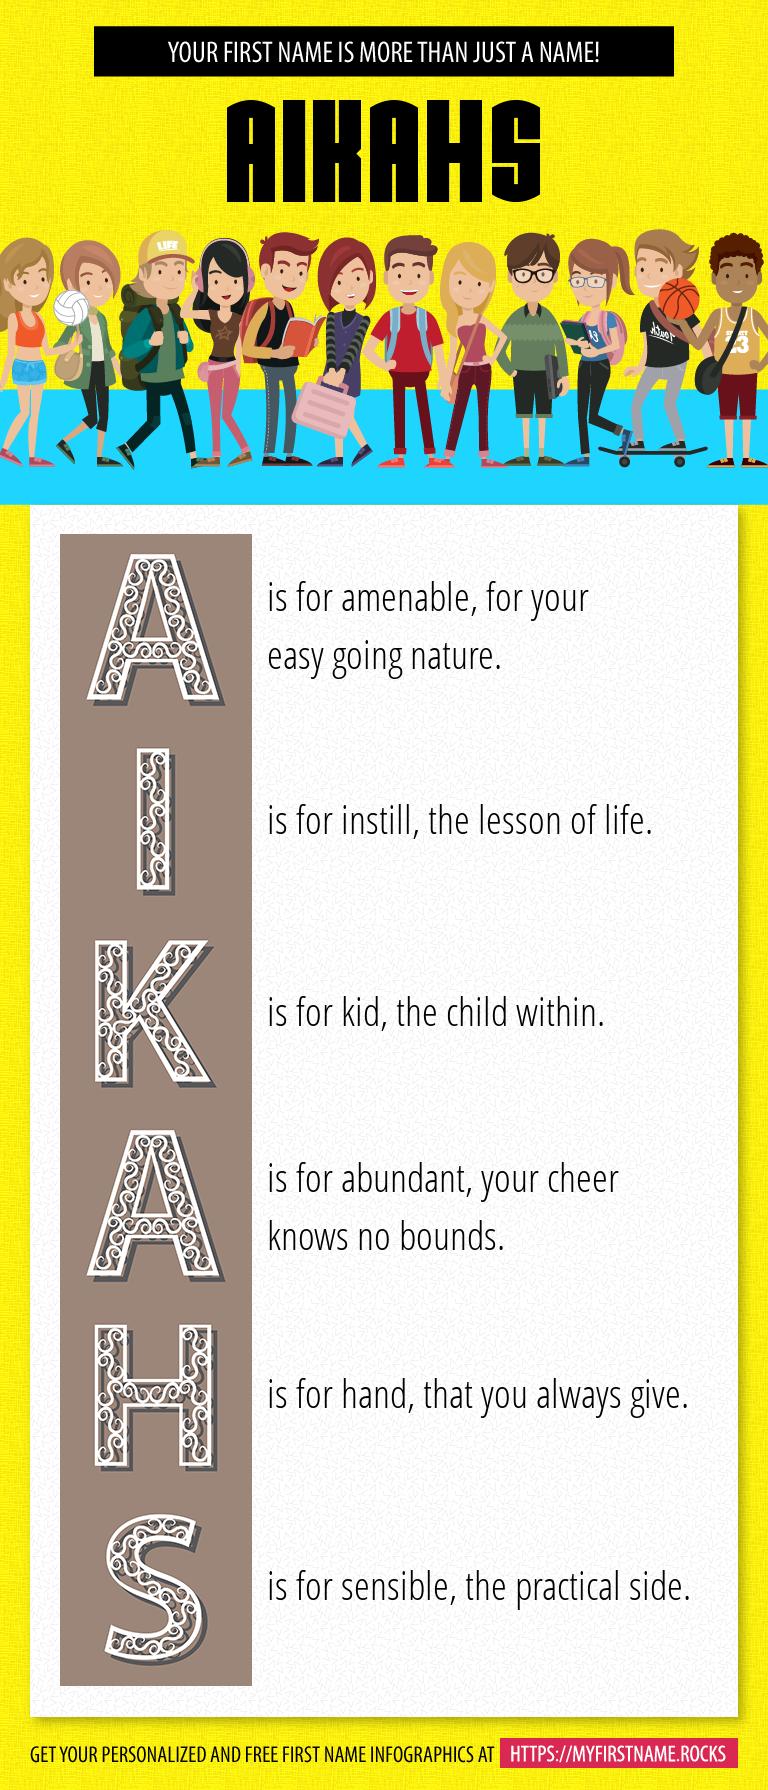 Aikahs Infographics